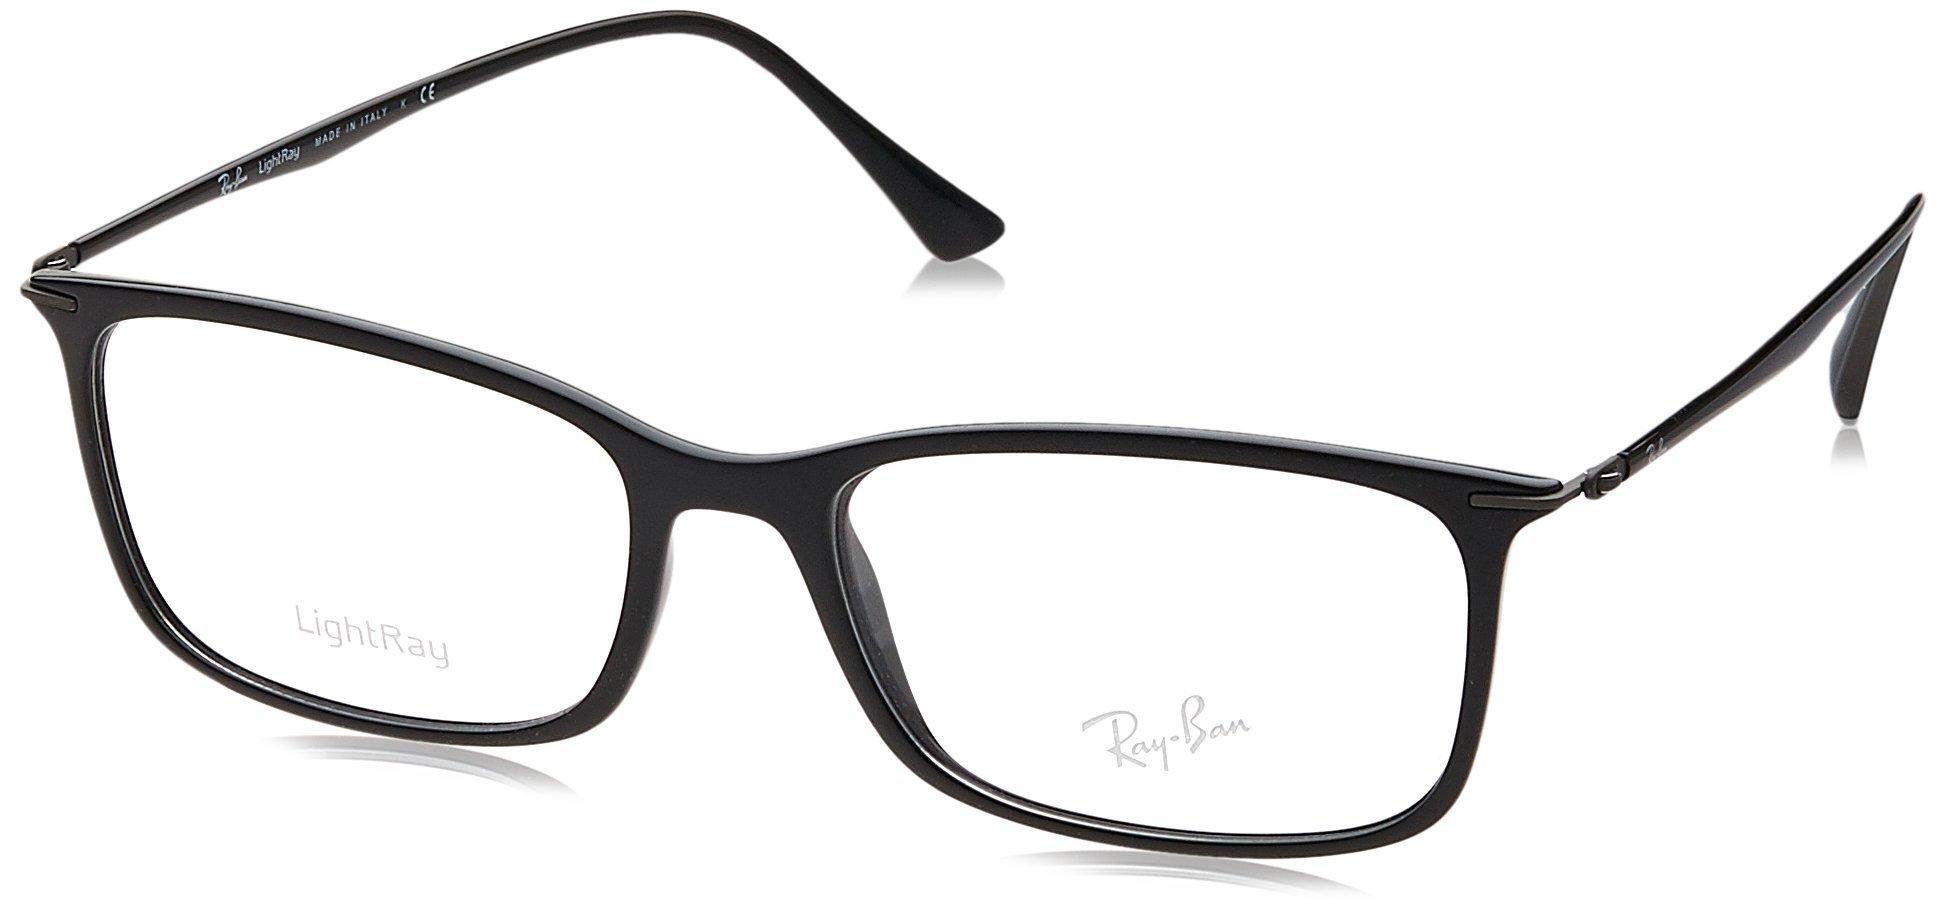 Ray-Ban Men's RX7031 Eyeglasses Shiny Black 53mm by Ray-Ban